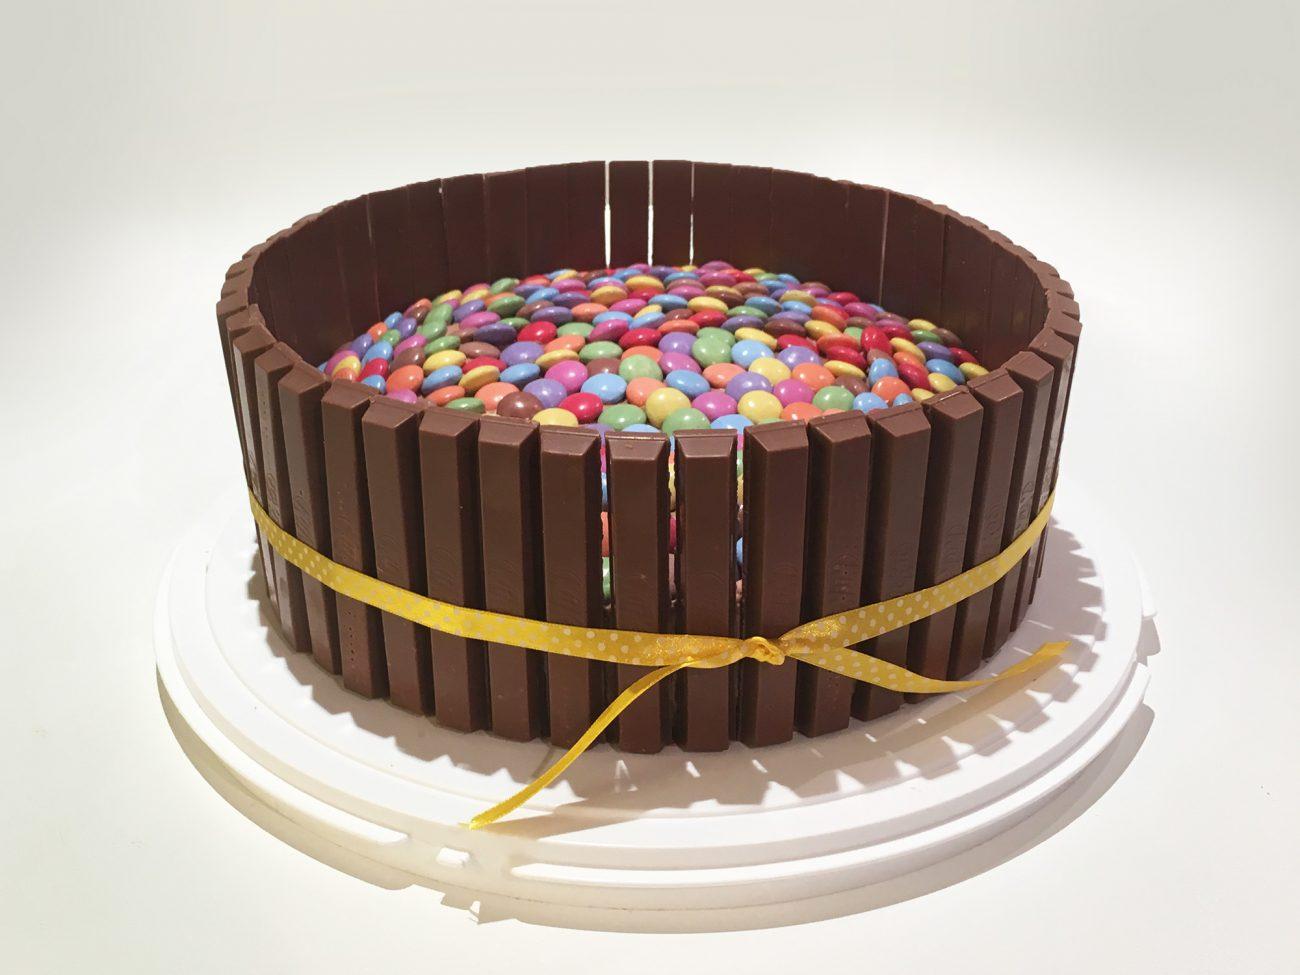 Torta Kitkat e Smarties